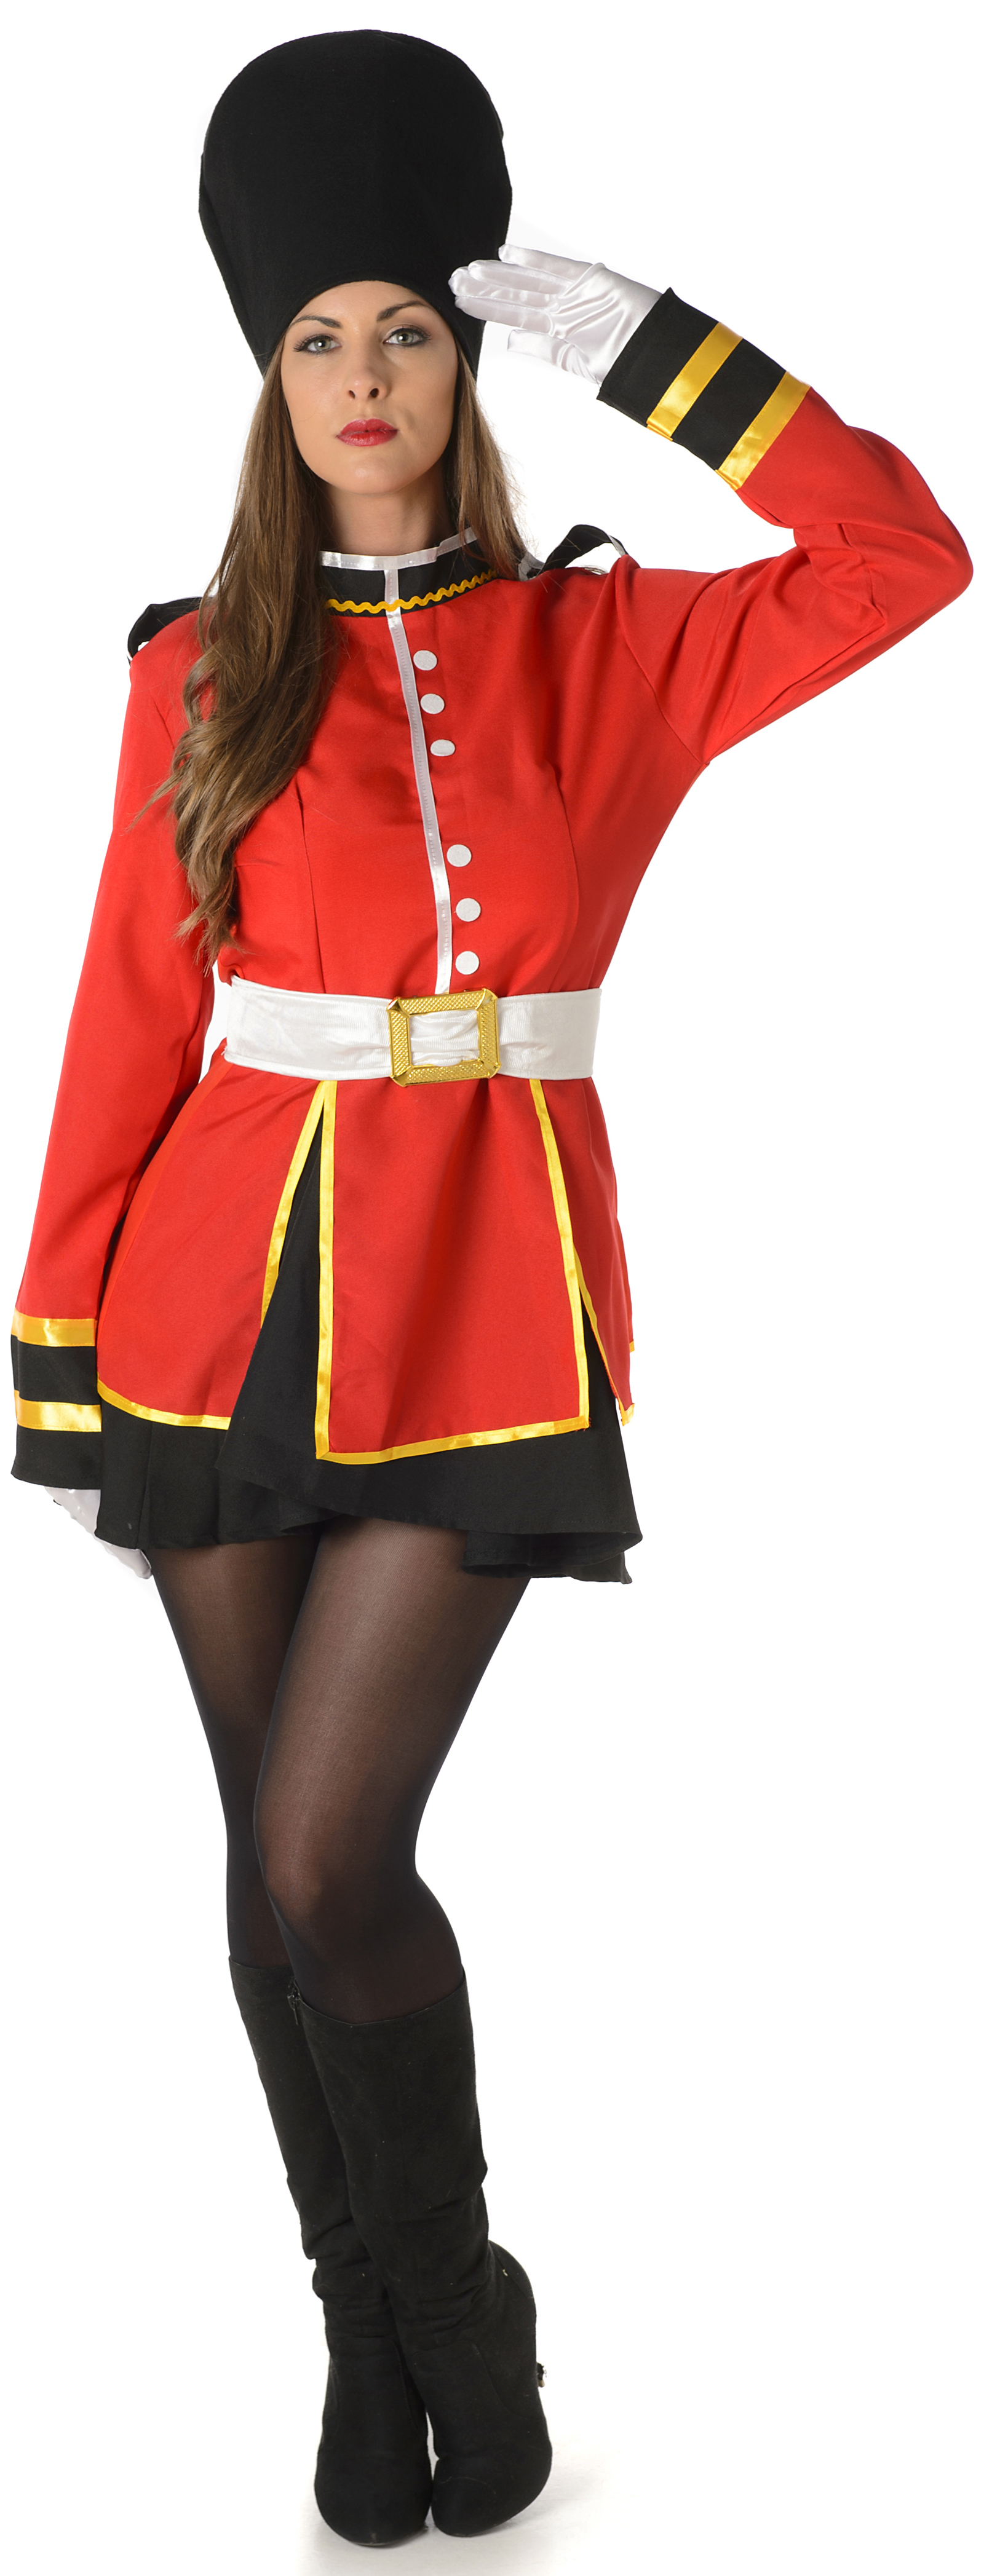 British Royal Guard Uniform 48